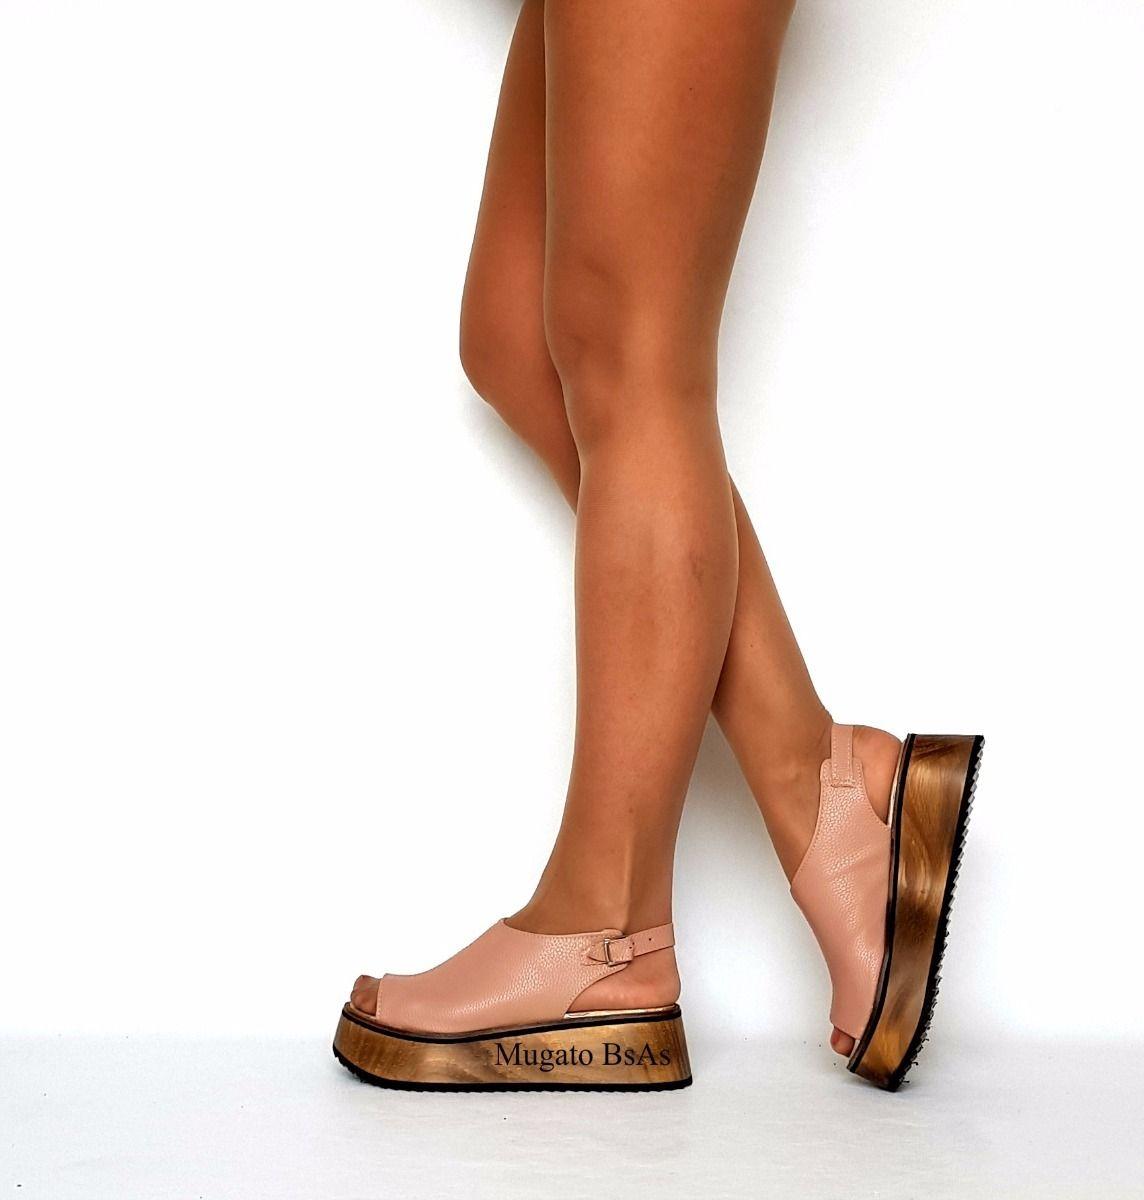 acddf04f9a9 Zapatos Sandalias Mujer Flecos Laterales Pretemporada 2018 ...